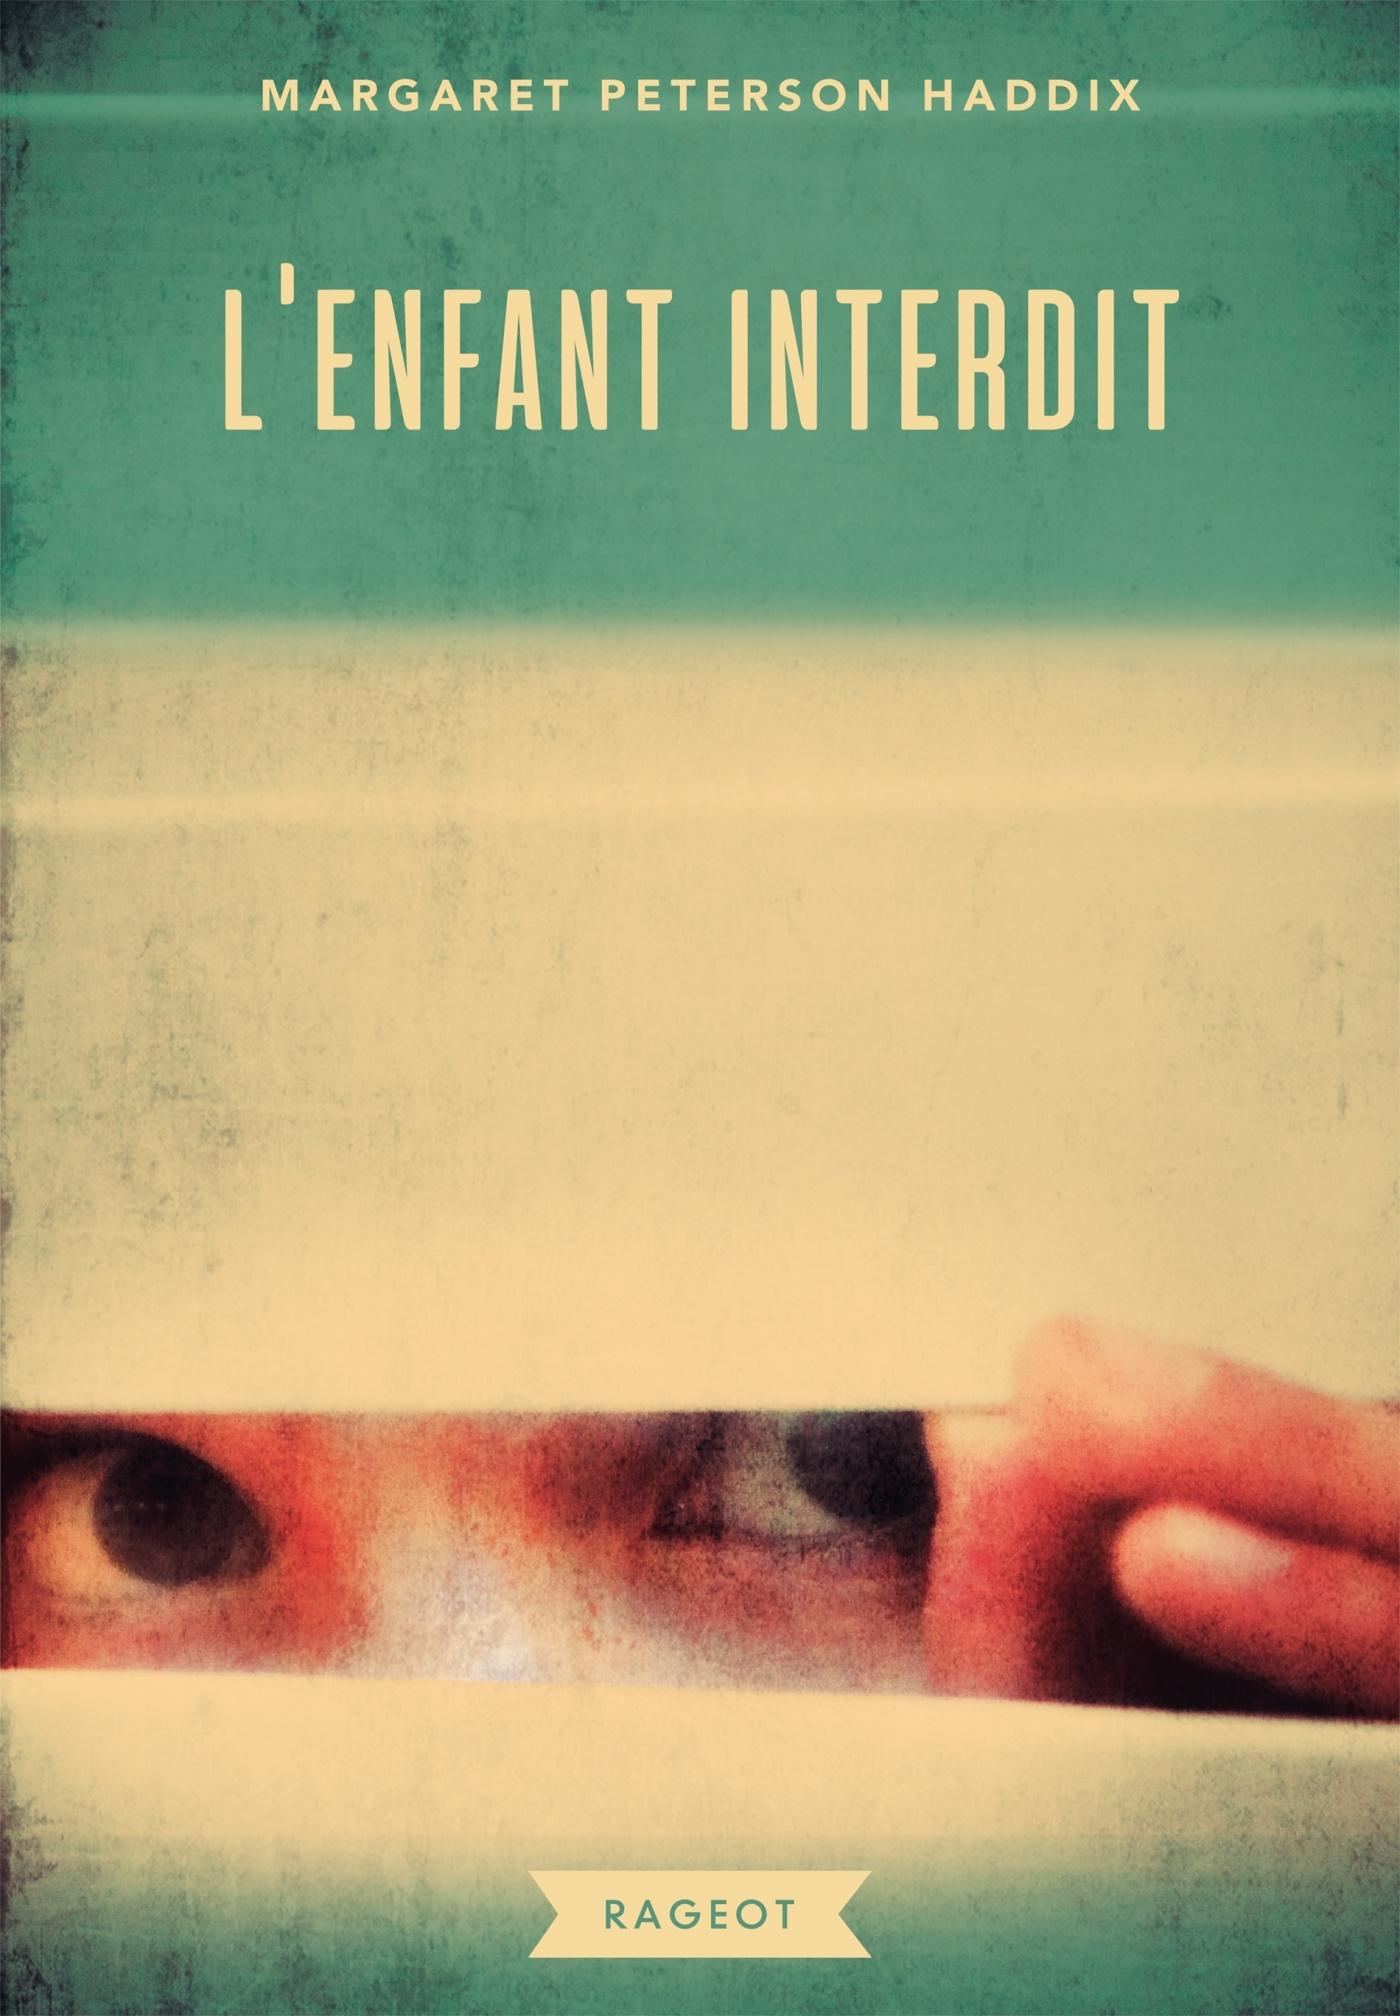 L'ENFANT INTERDIT